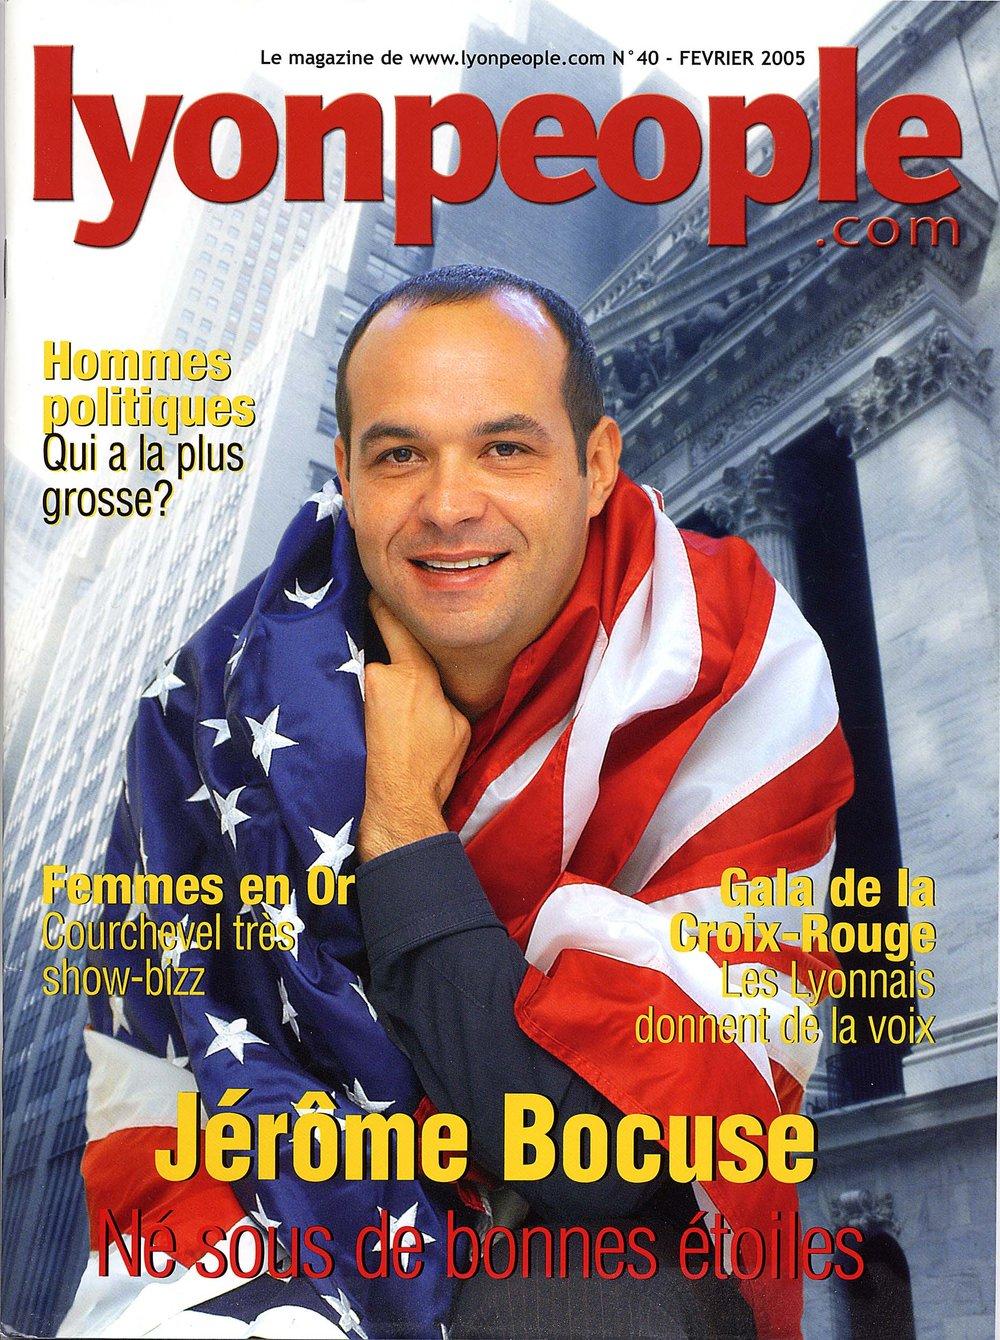 jerome_bocuse-8.jpg